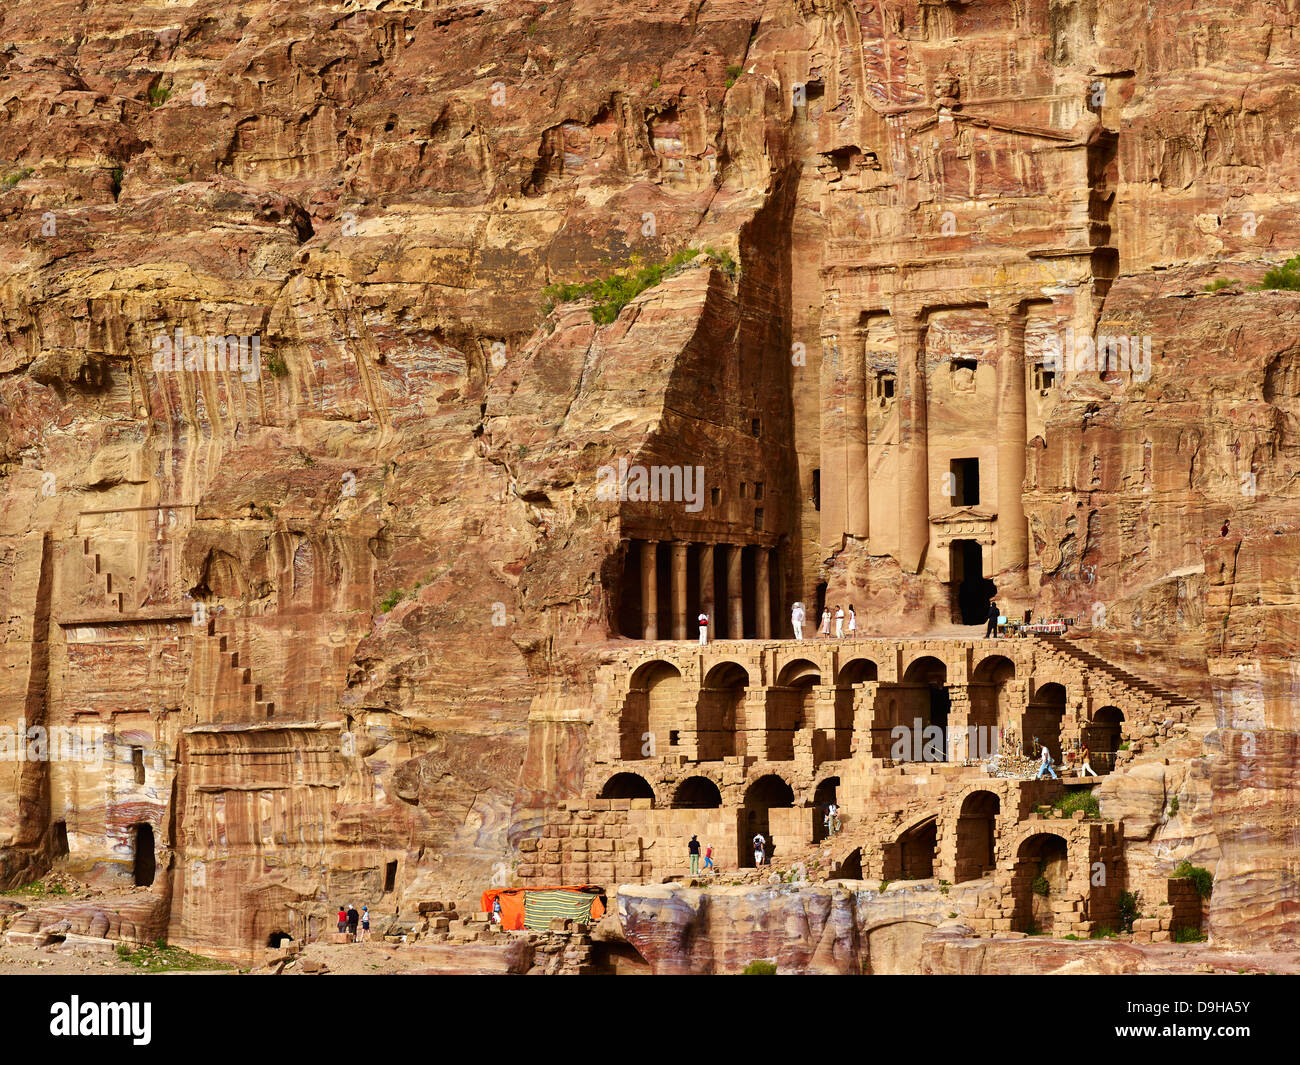 city of jordan middle east